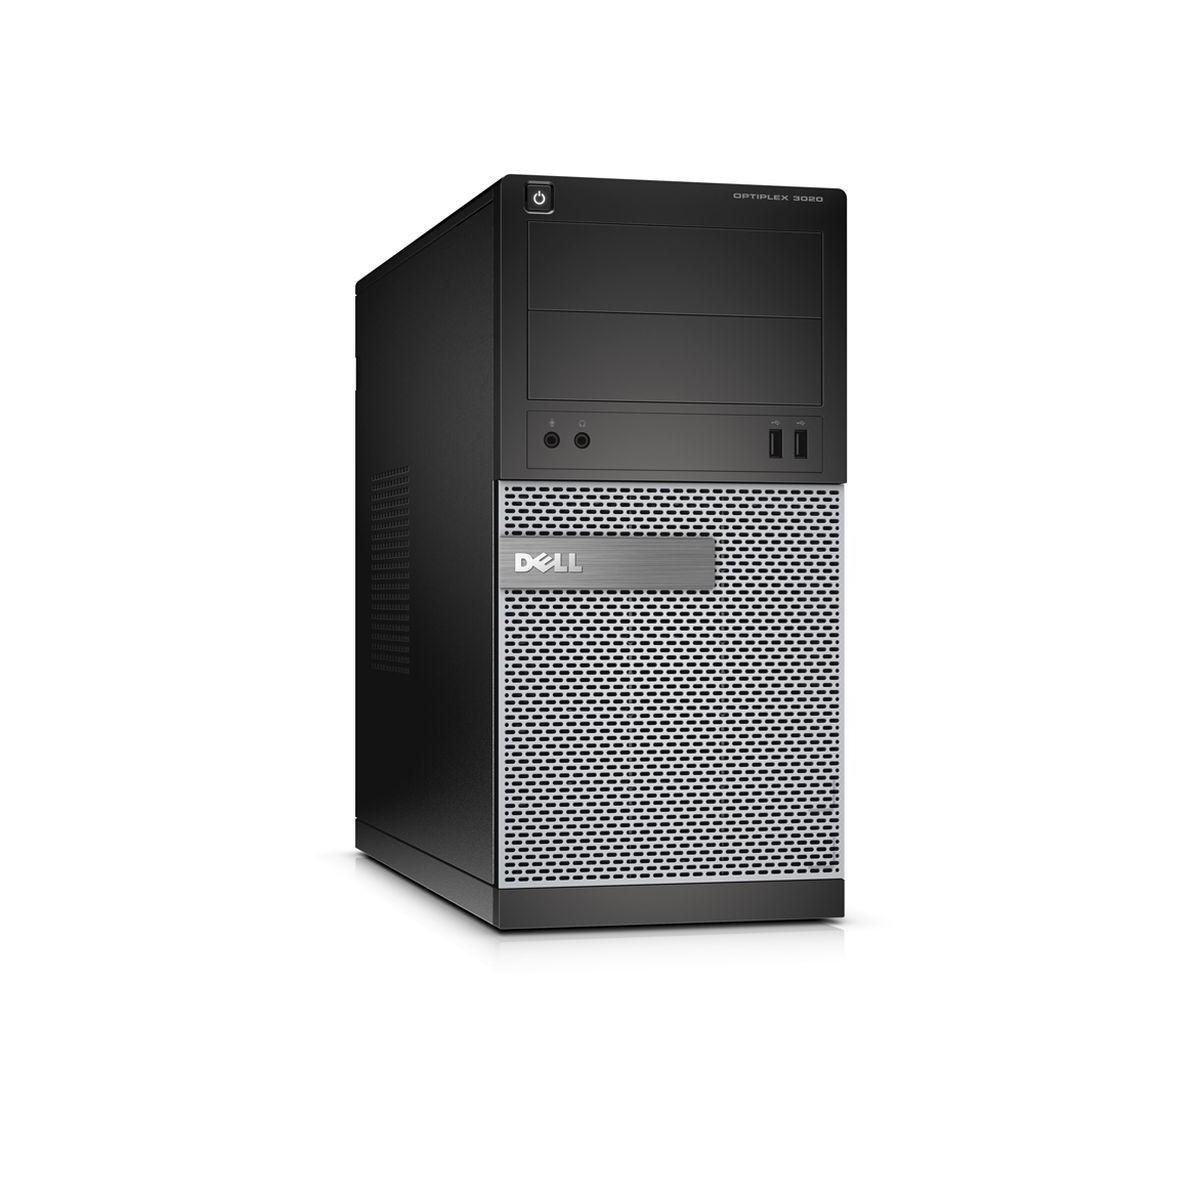 DELL 3020 MT i5-4570 8GB 500GB SSD WIN10 PRO